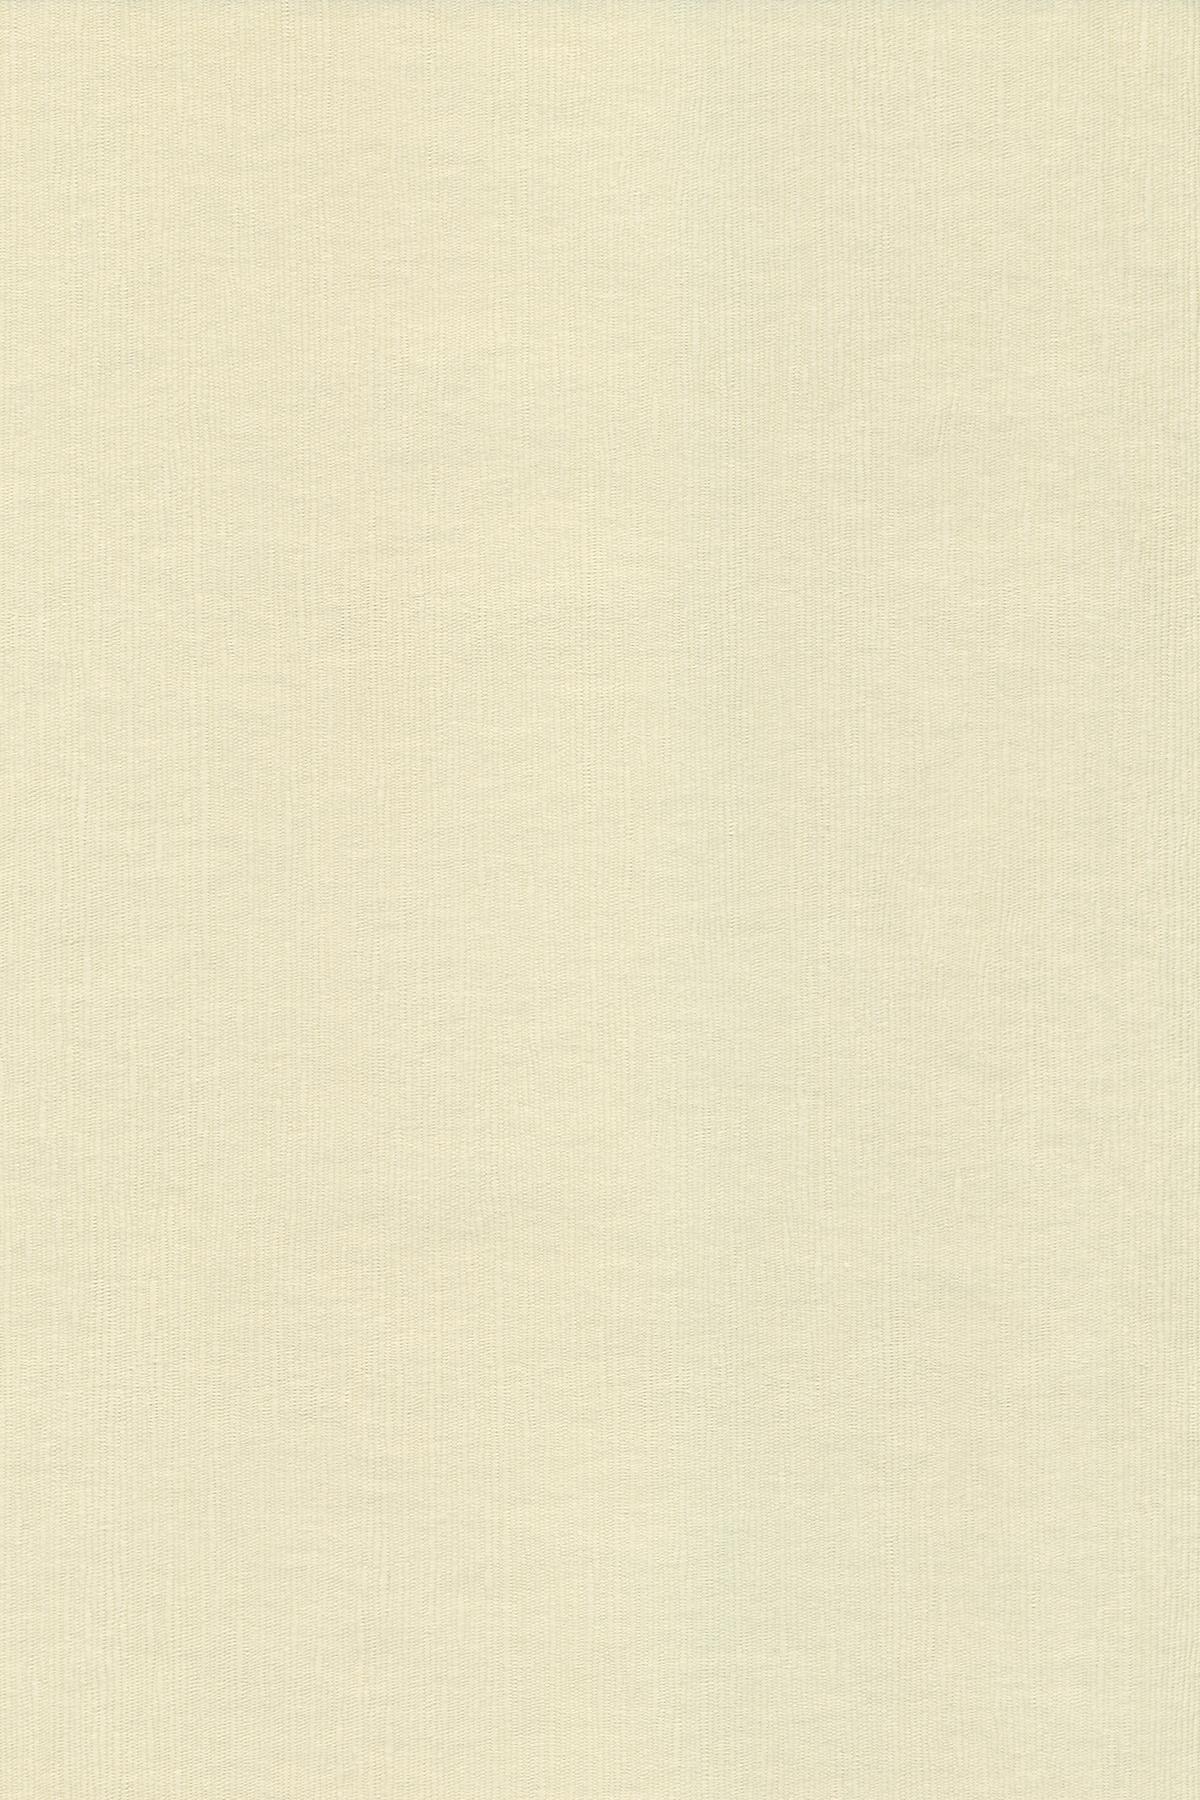 Japanese linen paper - white photo